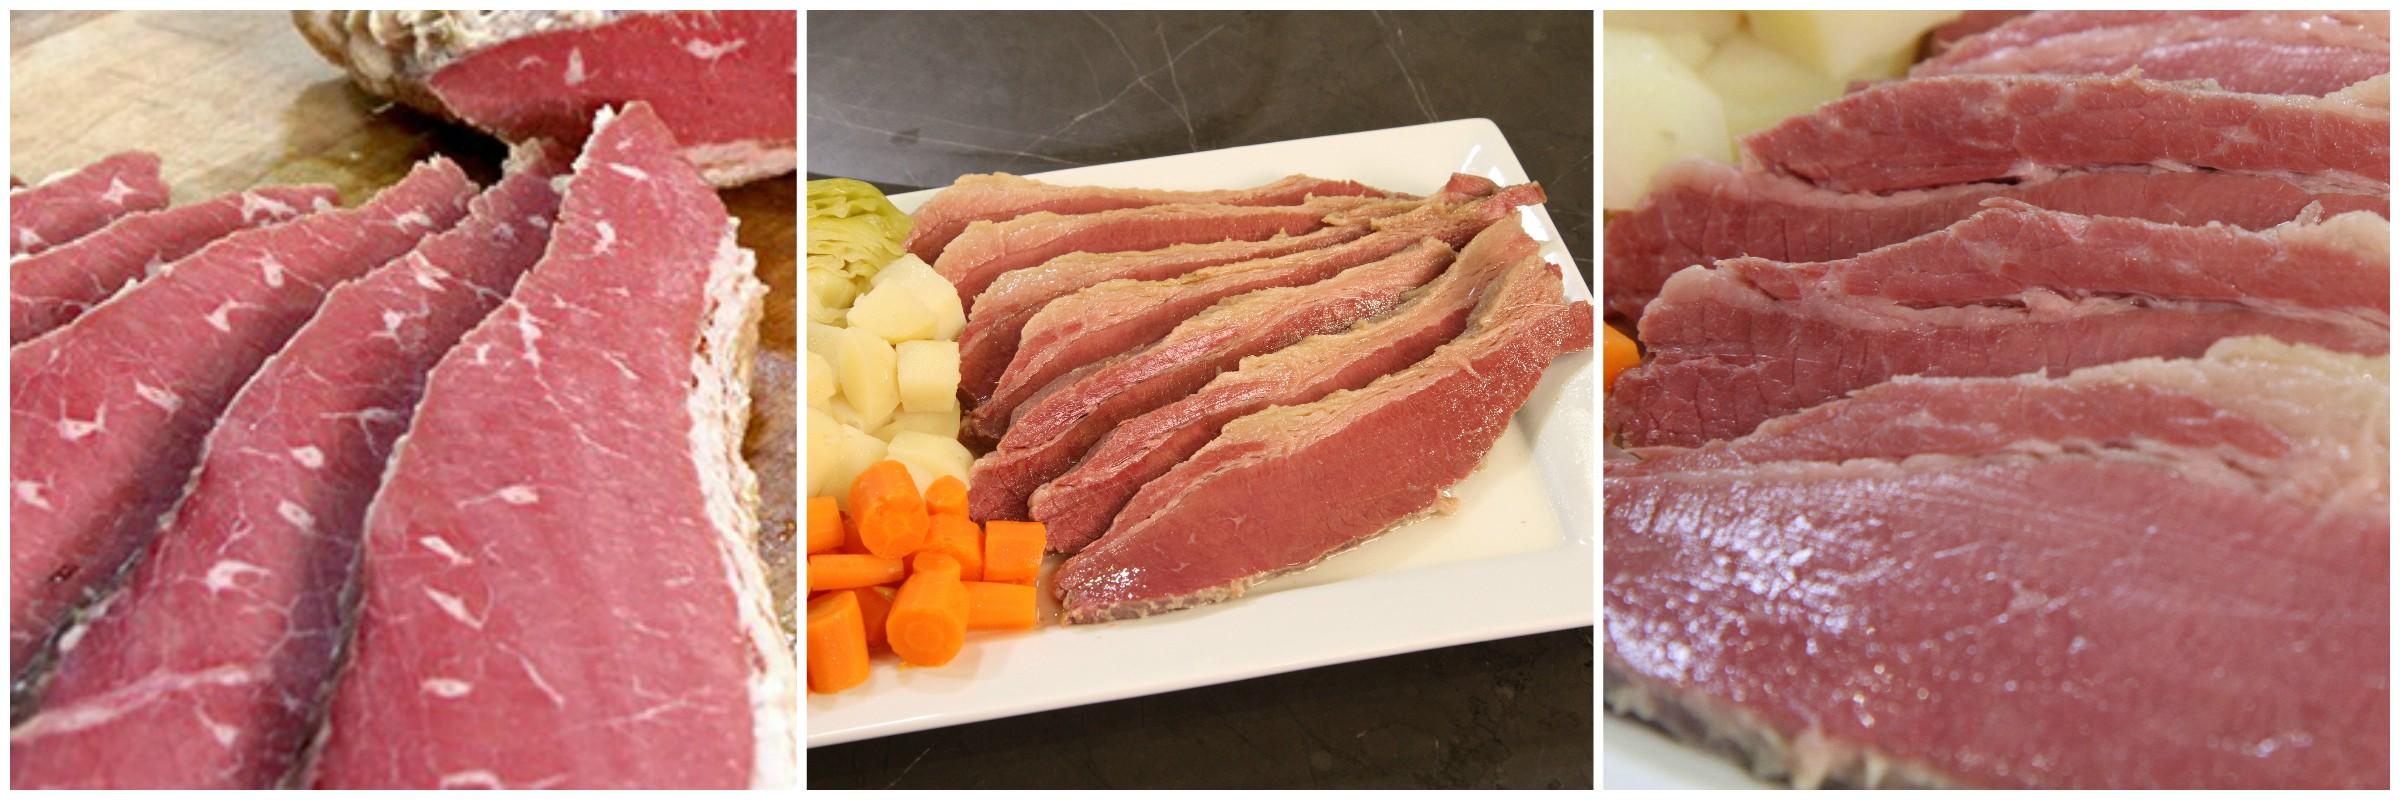 Perfect corned beef cut